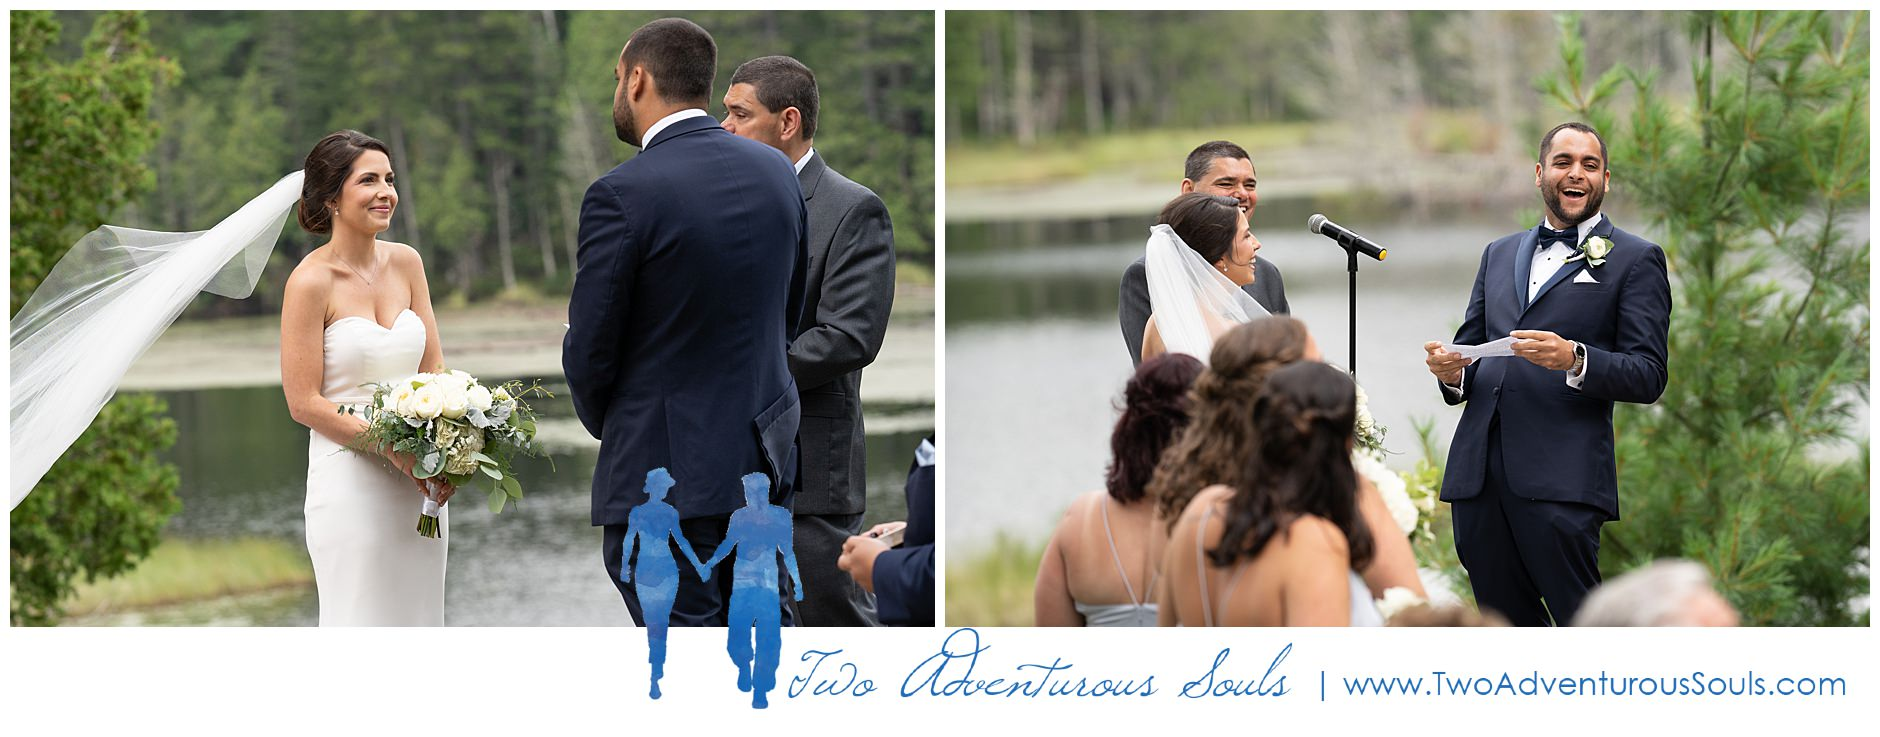 Sugarloaf Outdoor Center Wedding Photographers, Destination Wedding Photographers, Two Adventurous Souls-081719_0037.jpg